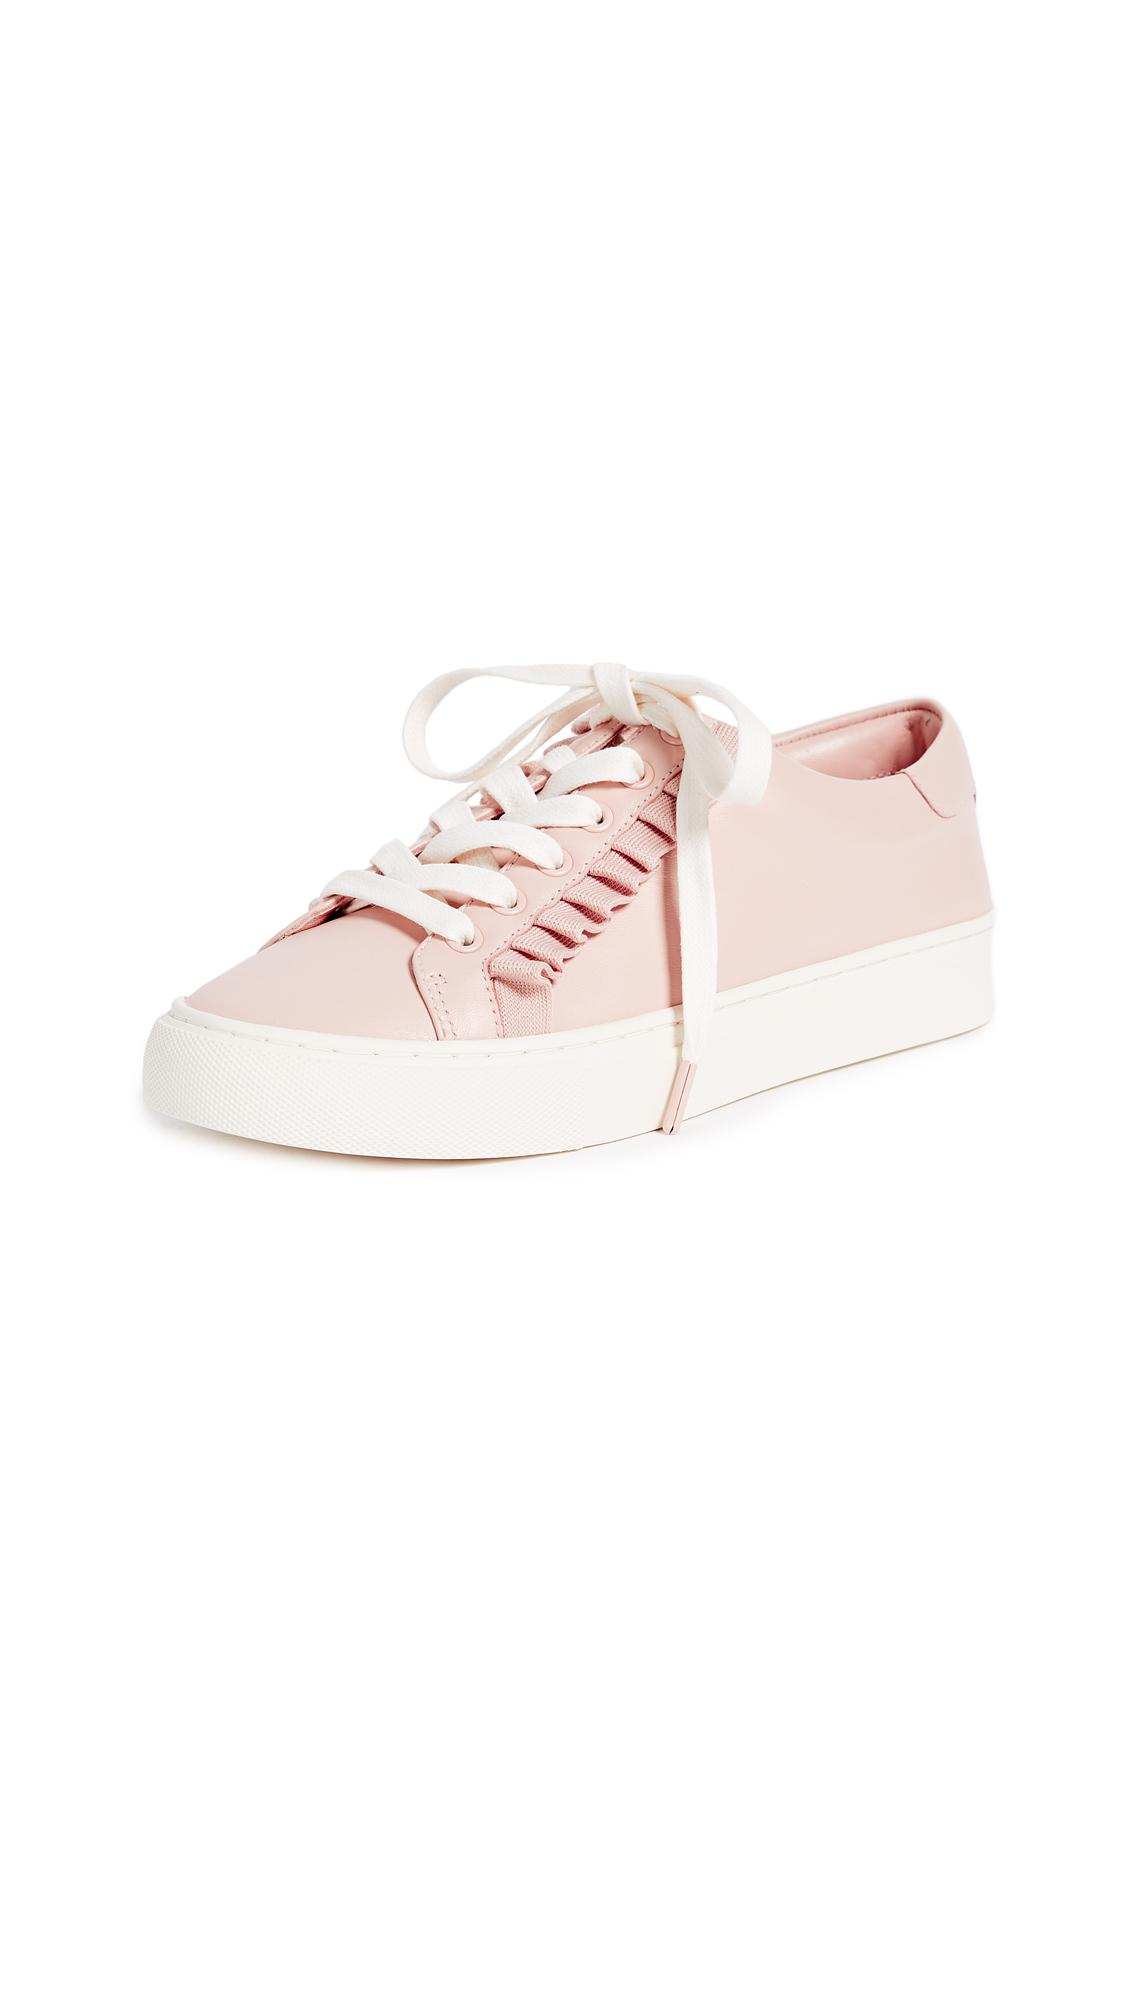 c775c08fdbdf Lyst - Tory Burch Tory Sport Ruffle Sneakers in Pink